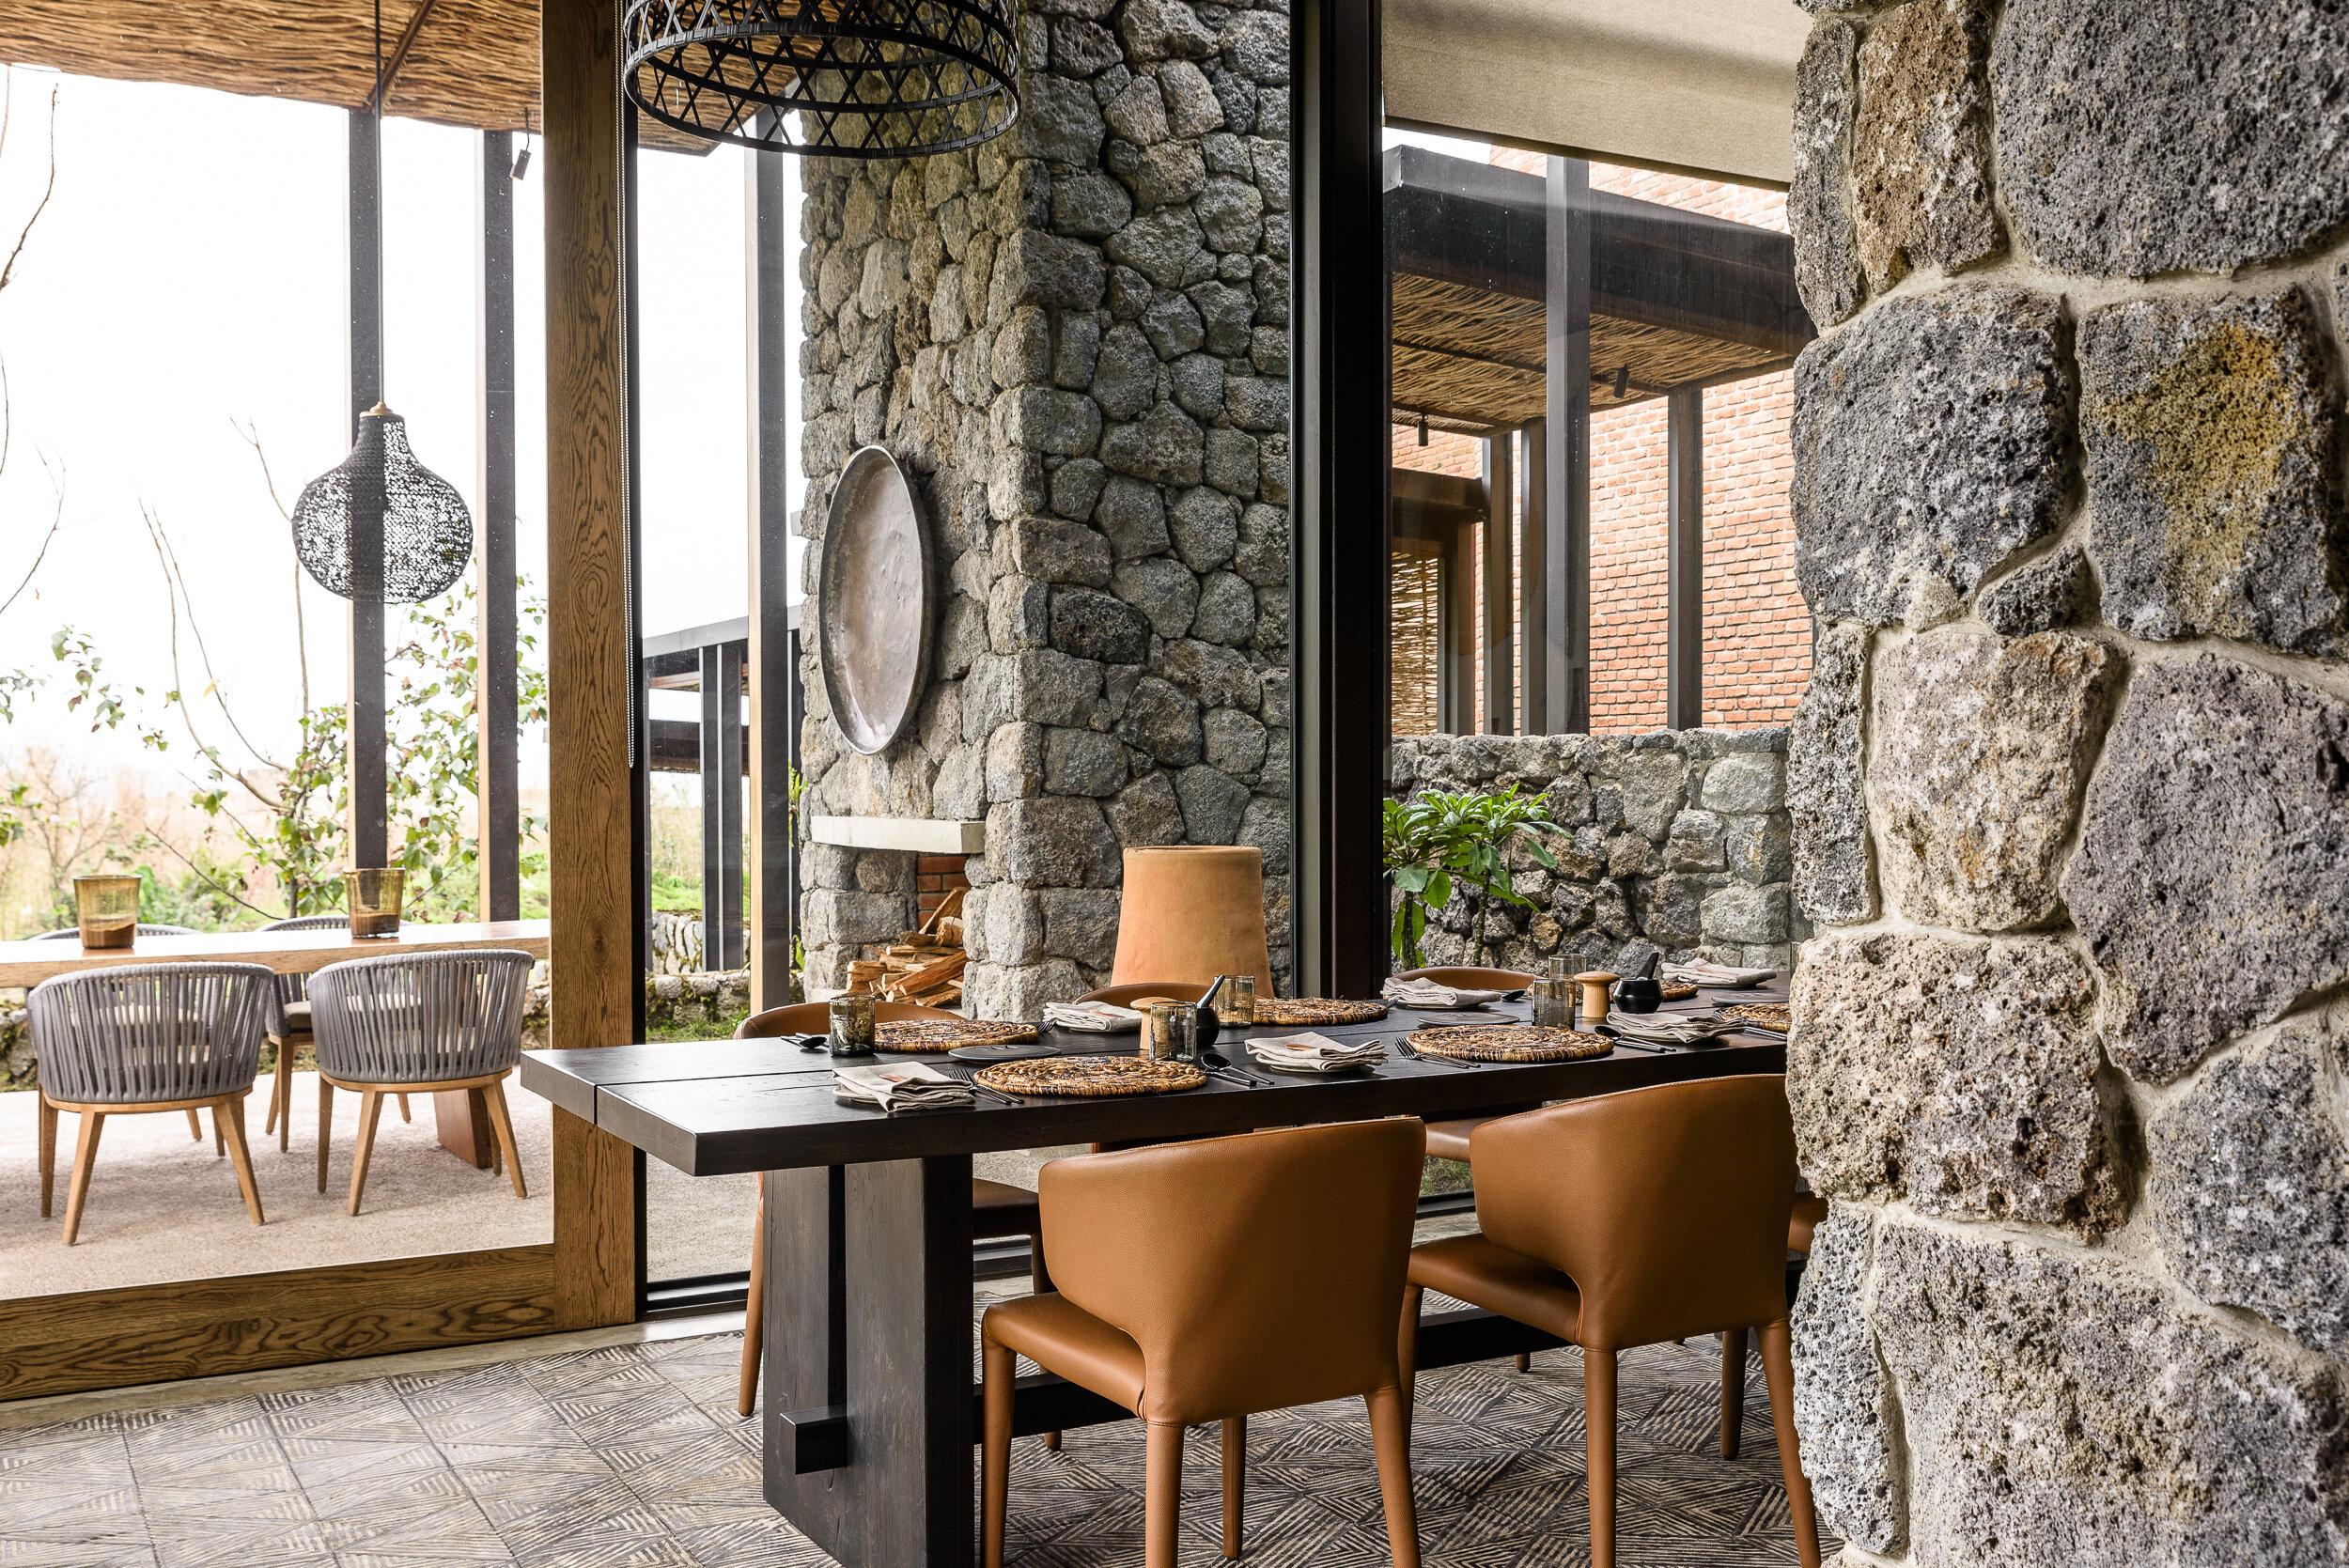 Singita-Kwitonda-Lodge-Dining-Area-3.jpg